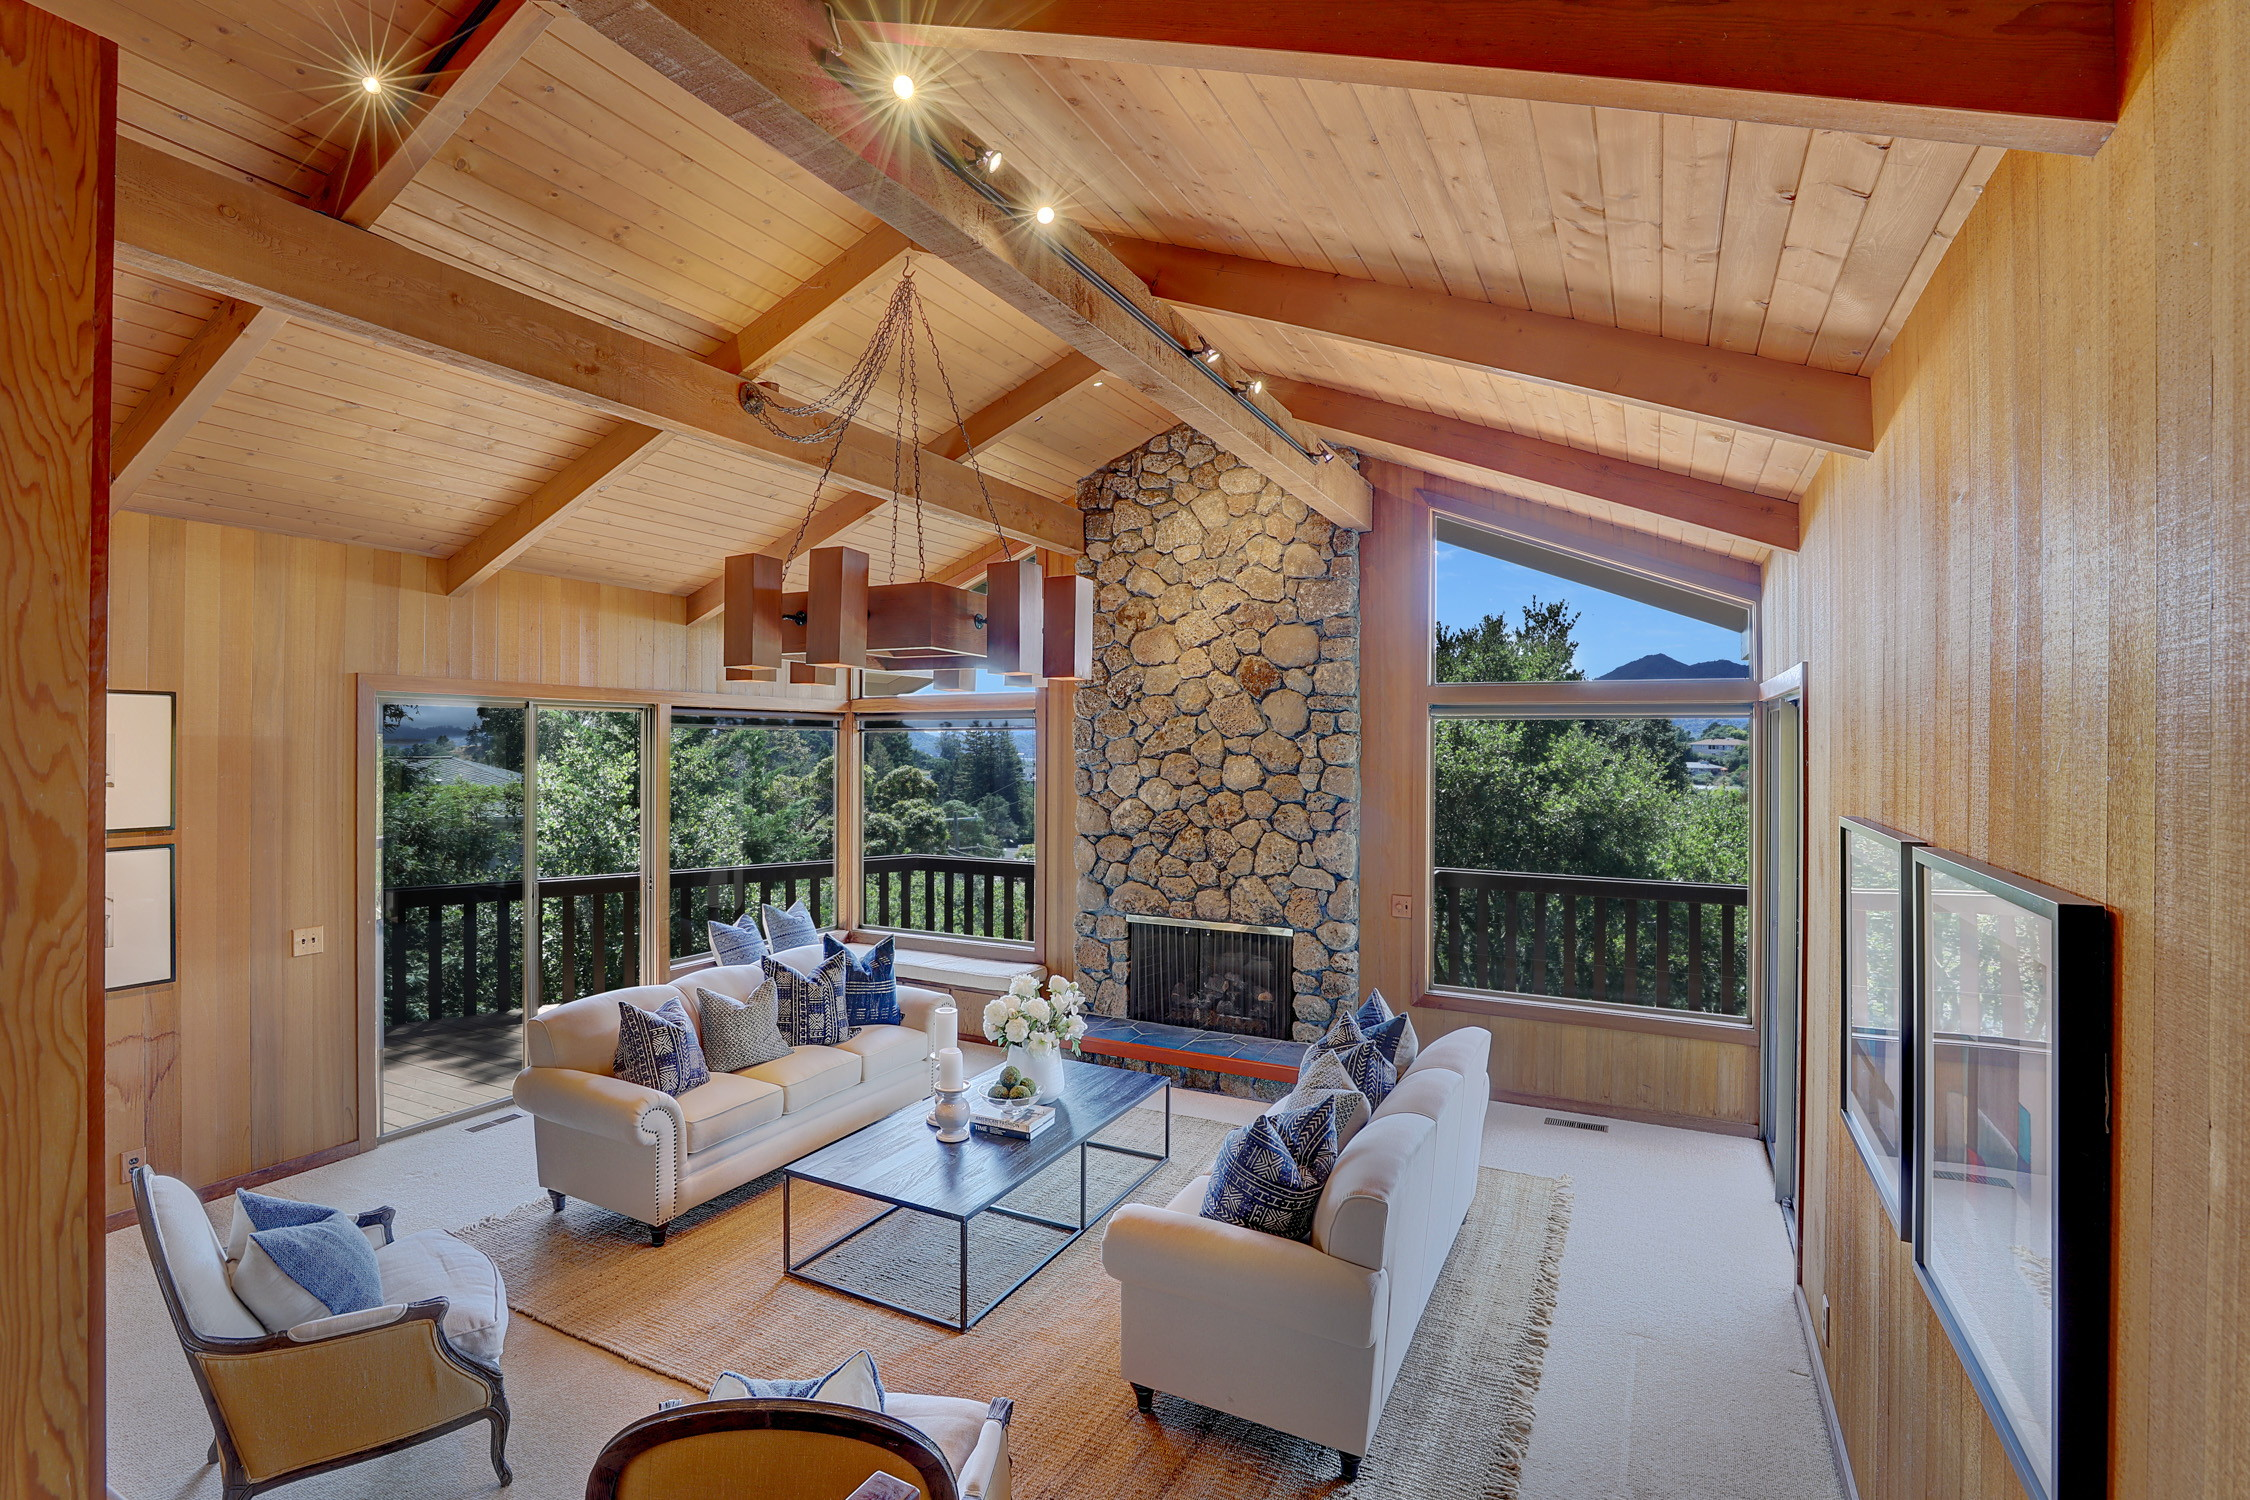 16Dorian 09 MLSSan Rafael Real Estate - Listed by Julia Fitzpatrick + Allie Fornesi Team Own Marin County .jpg